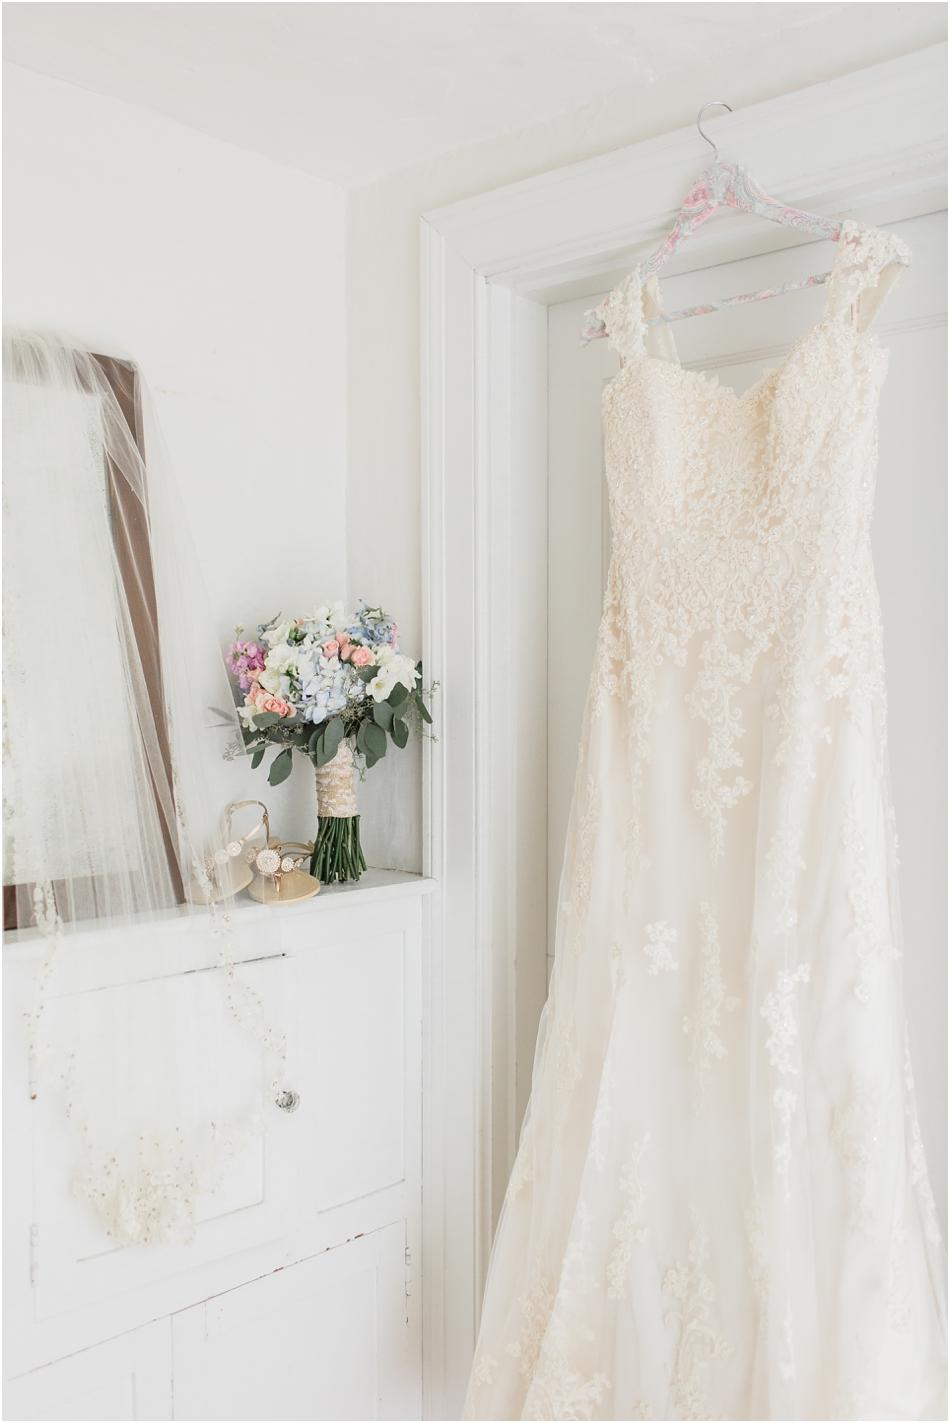 overbrook_house_buzzards_bay_boston_massachusetts_cape_cod_new_england_wedding_photographer_Meredith_Jane_Photography_photo_1607.jpg